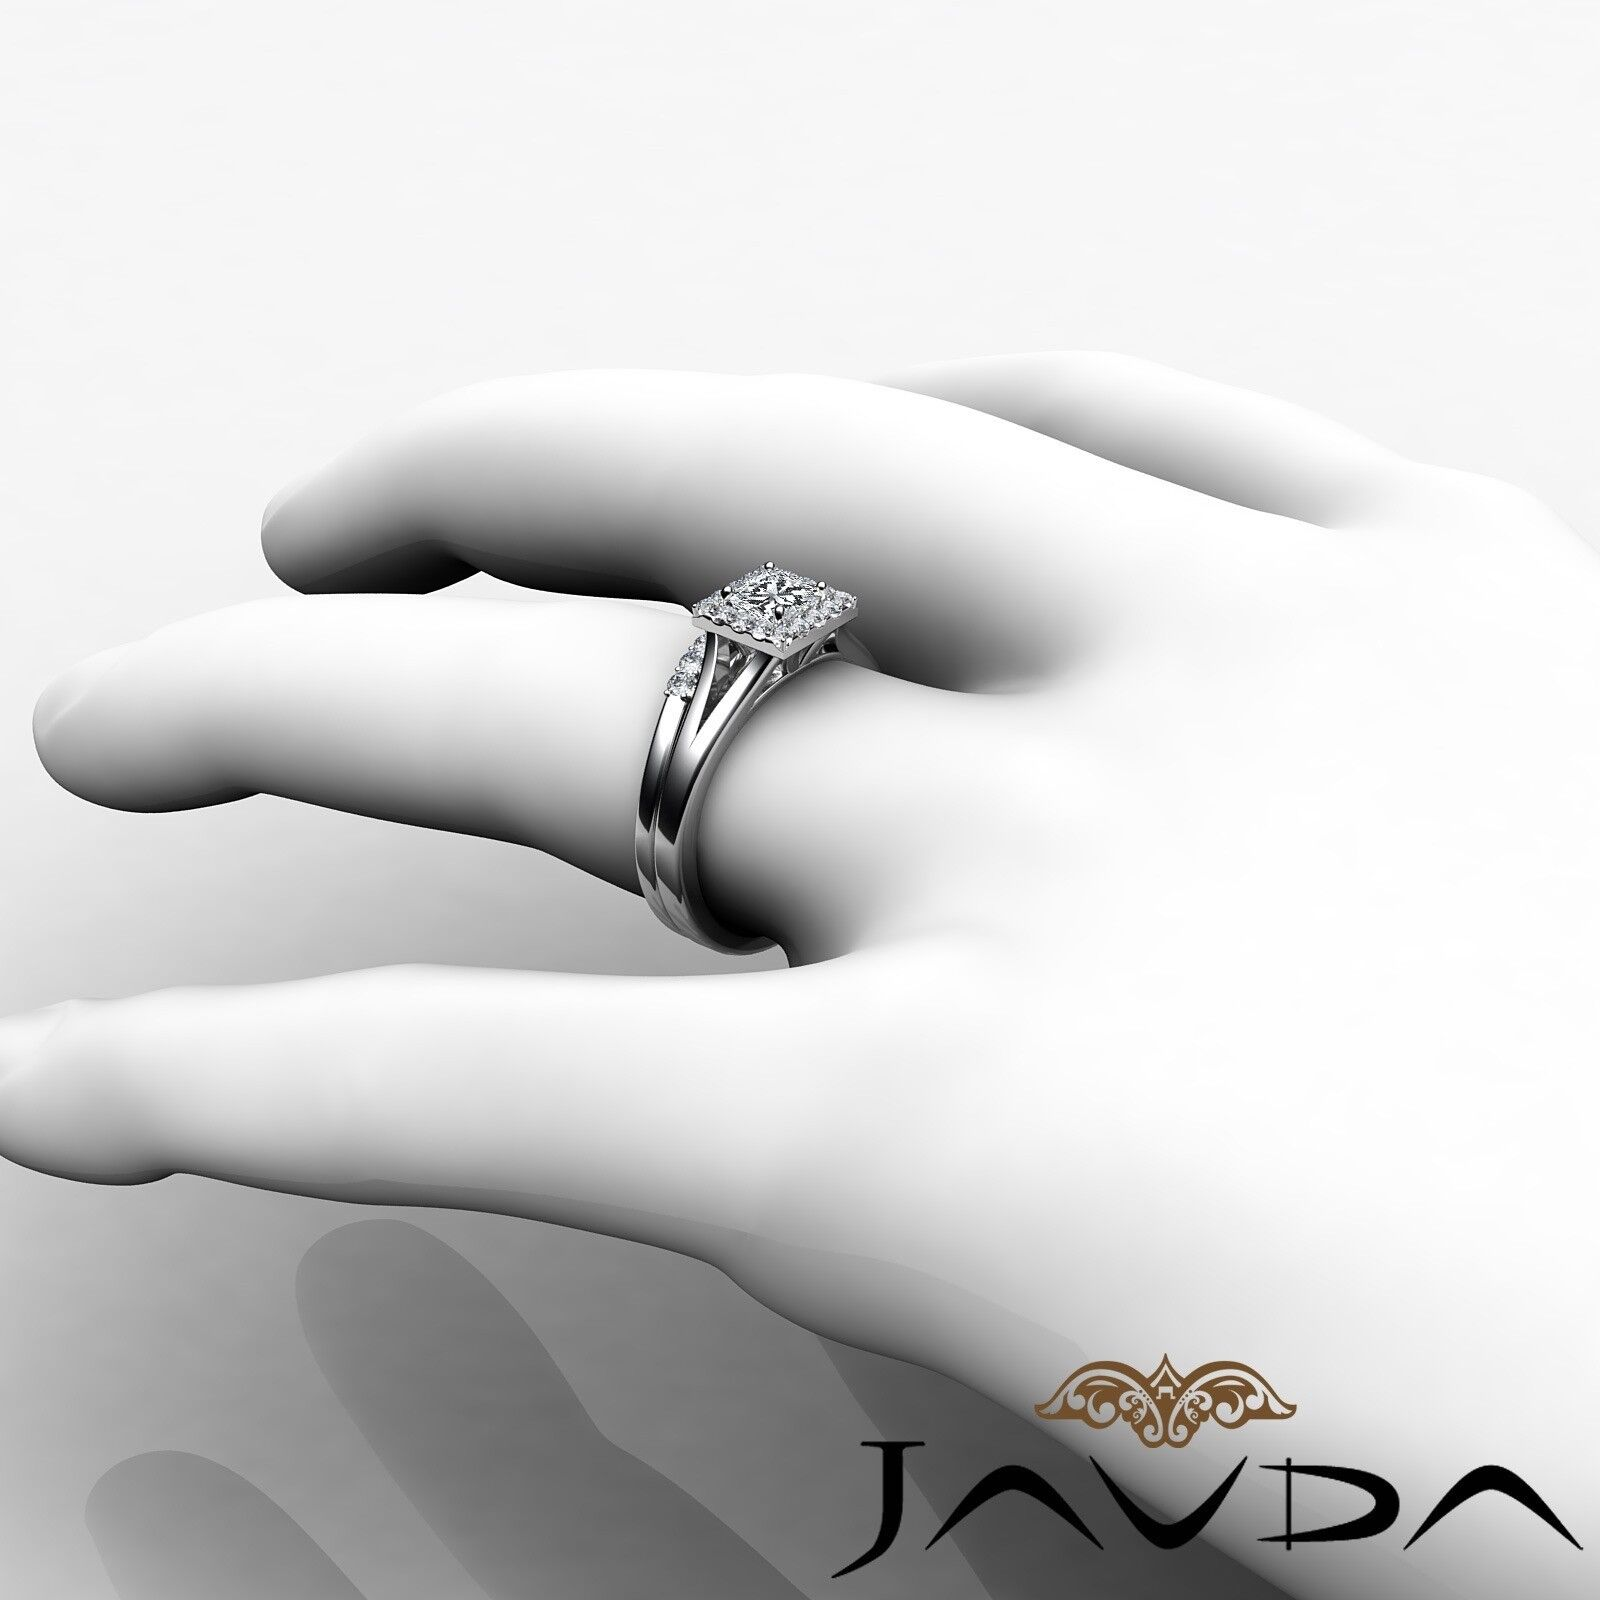 0.93ctw Halo Pave Bridal Princess Diamond Engagement Ring GIA F-VVS1 White Gold 5